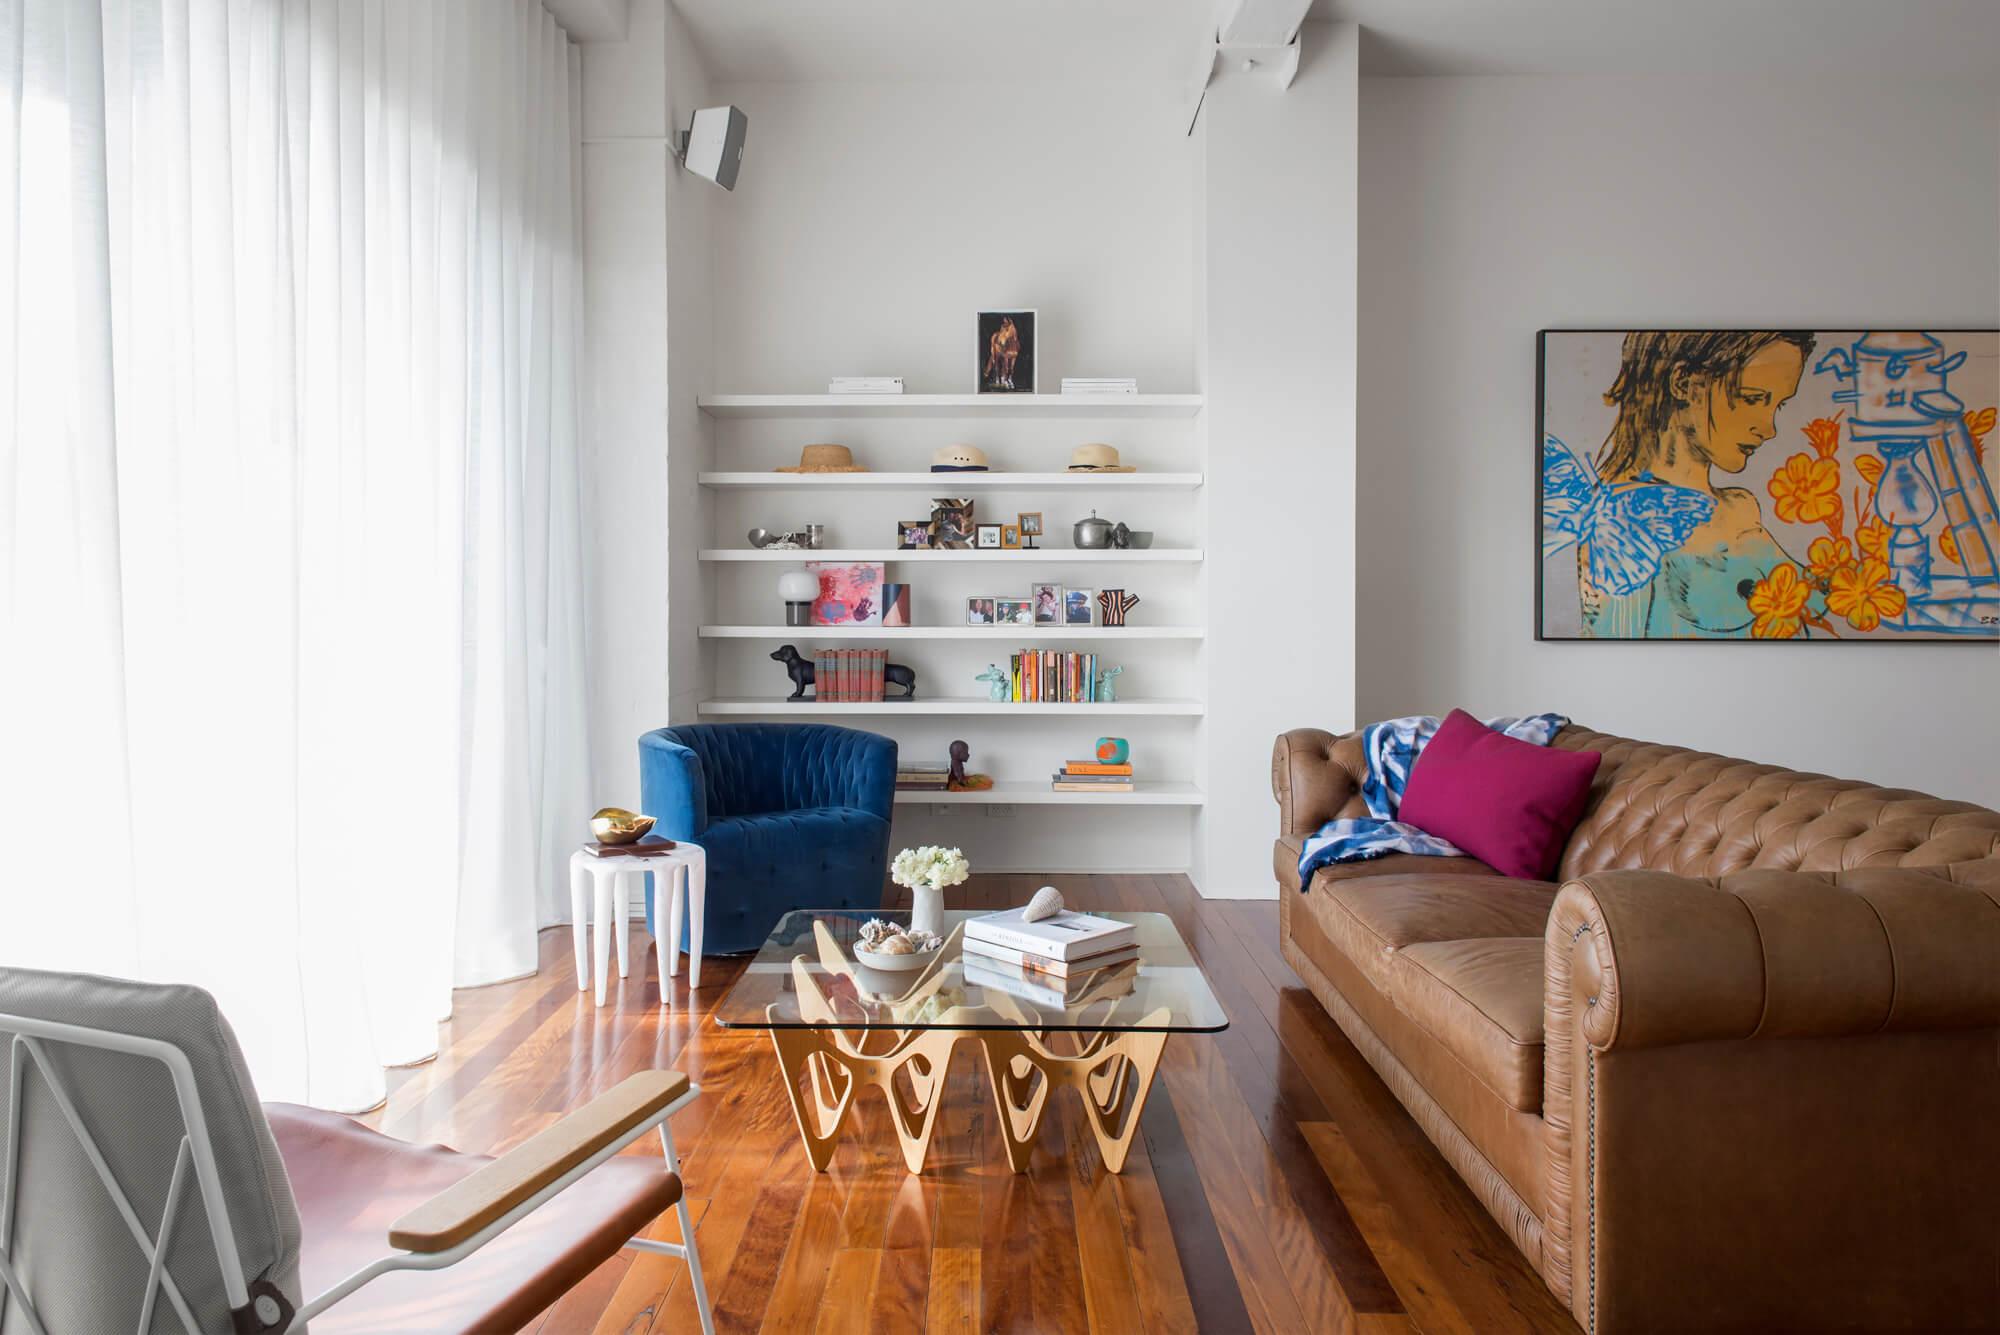 georgia-cannon-interior-designer-brisbane-project-m4-house-07.jpg